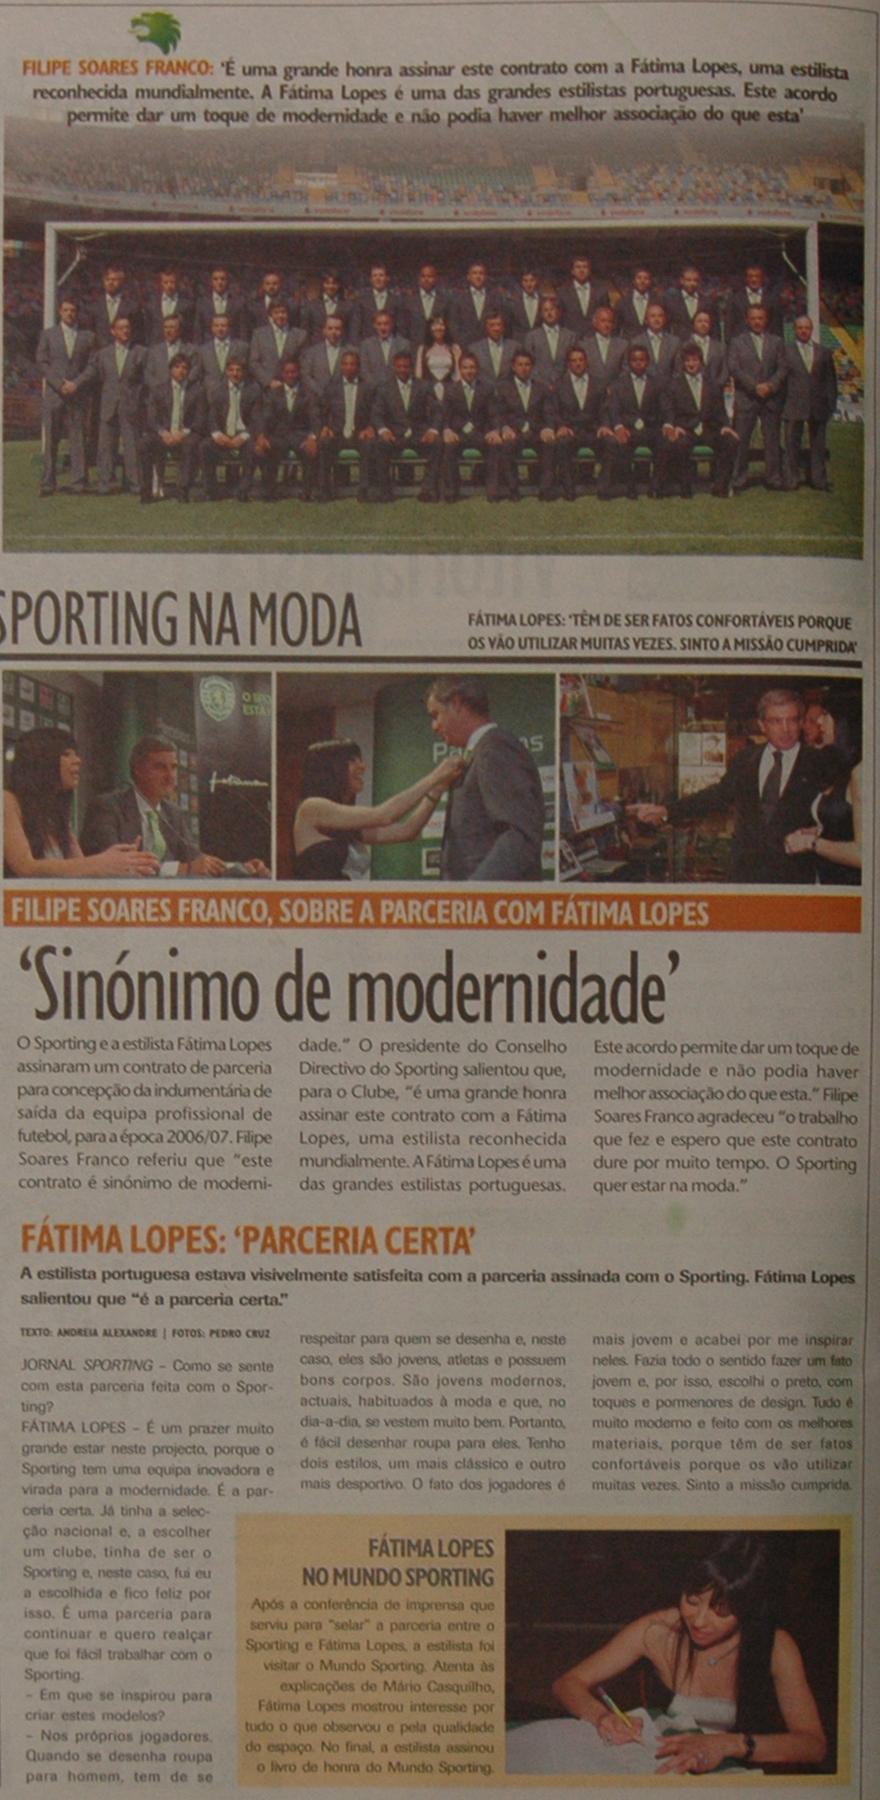 Sporting-na-moda-2006-Fatima-Lopes